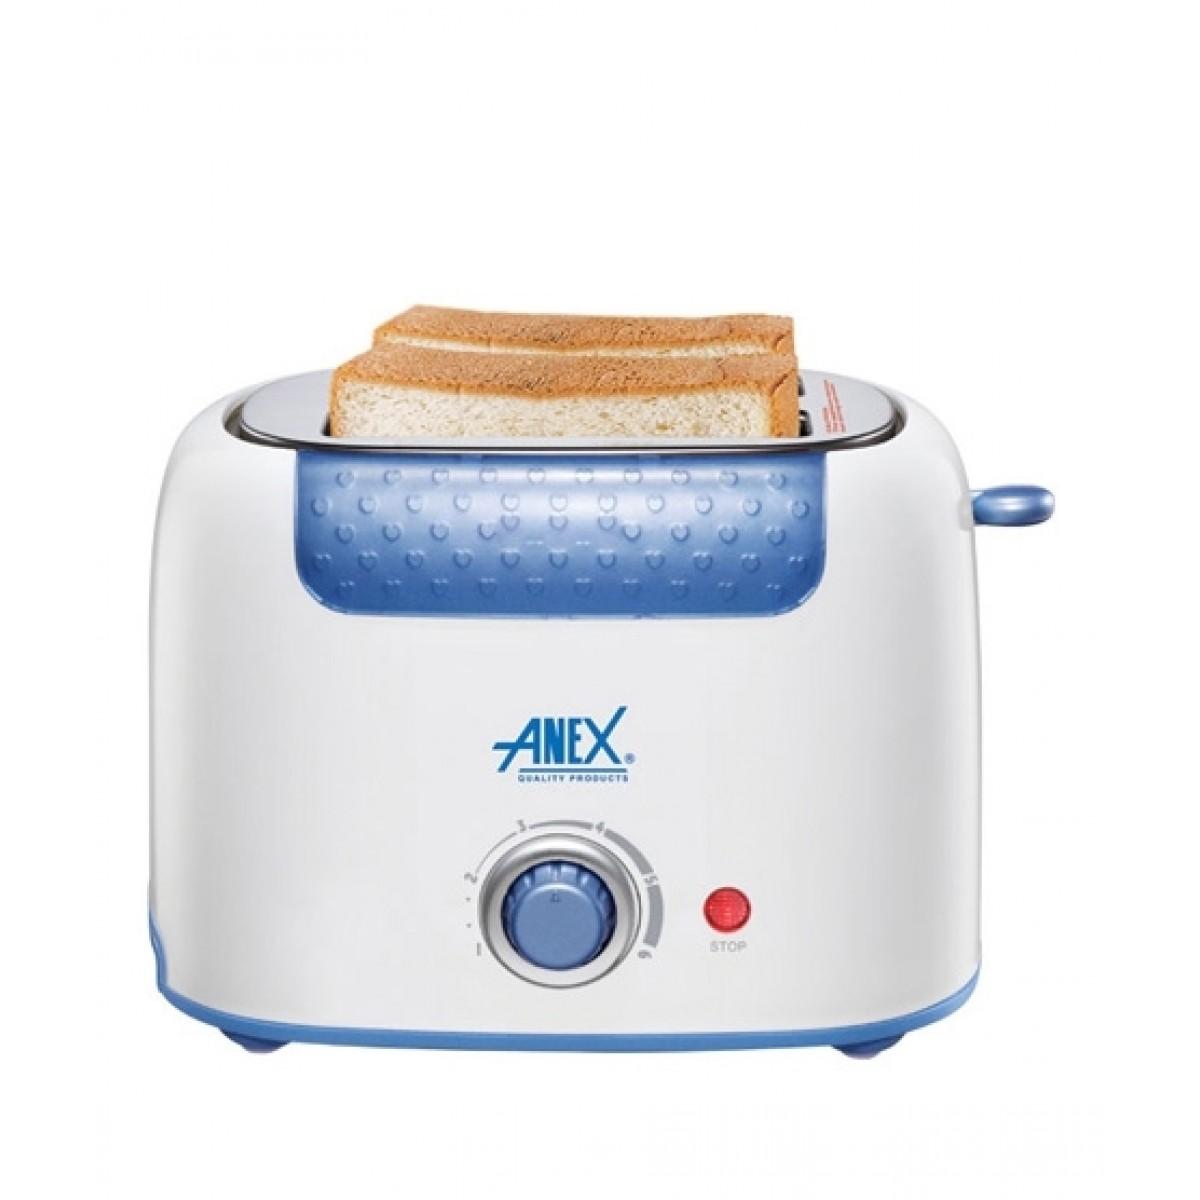 Anex 2 Slice Toaster (AG-3001)